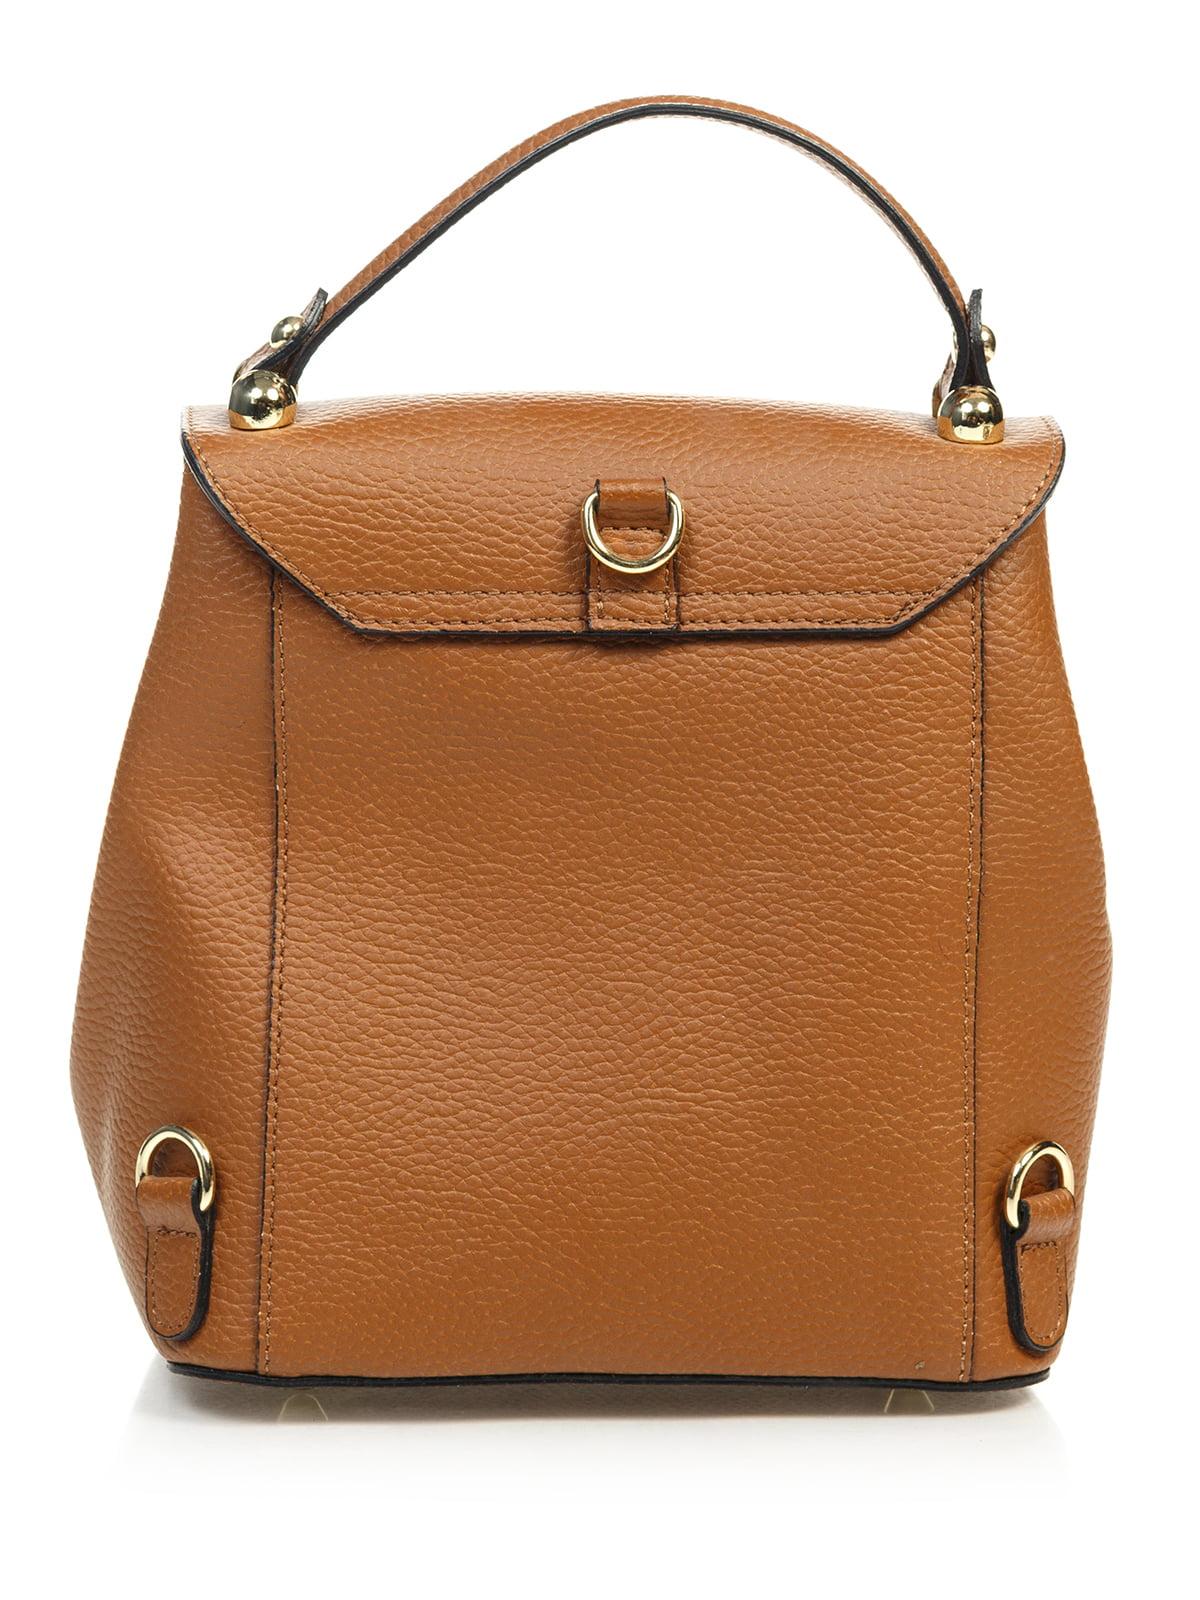 Сумка-рюкзак коньячного кольору | 4901299 | фото 2